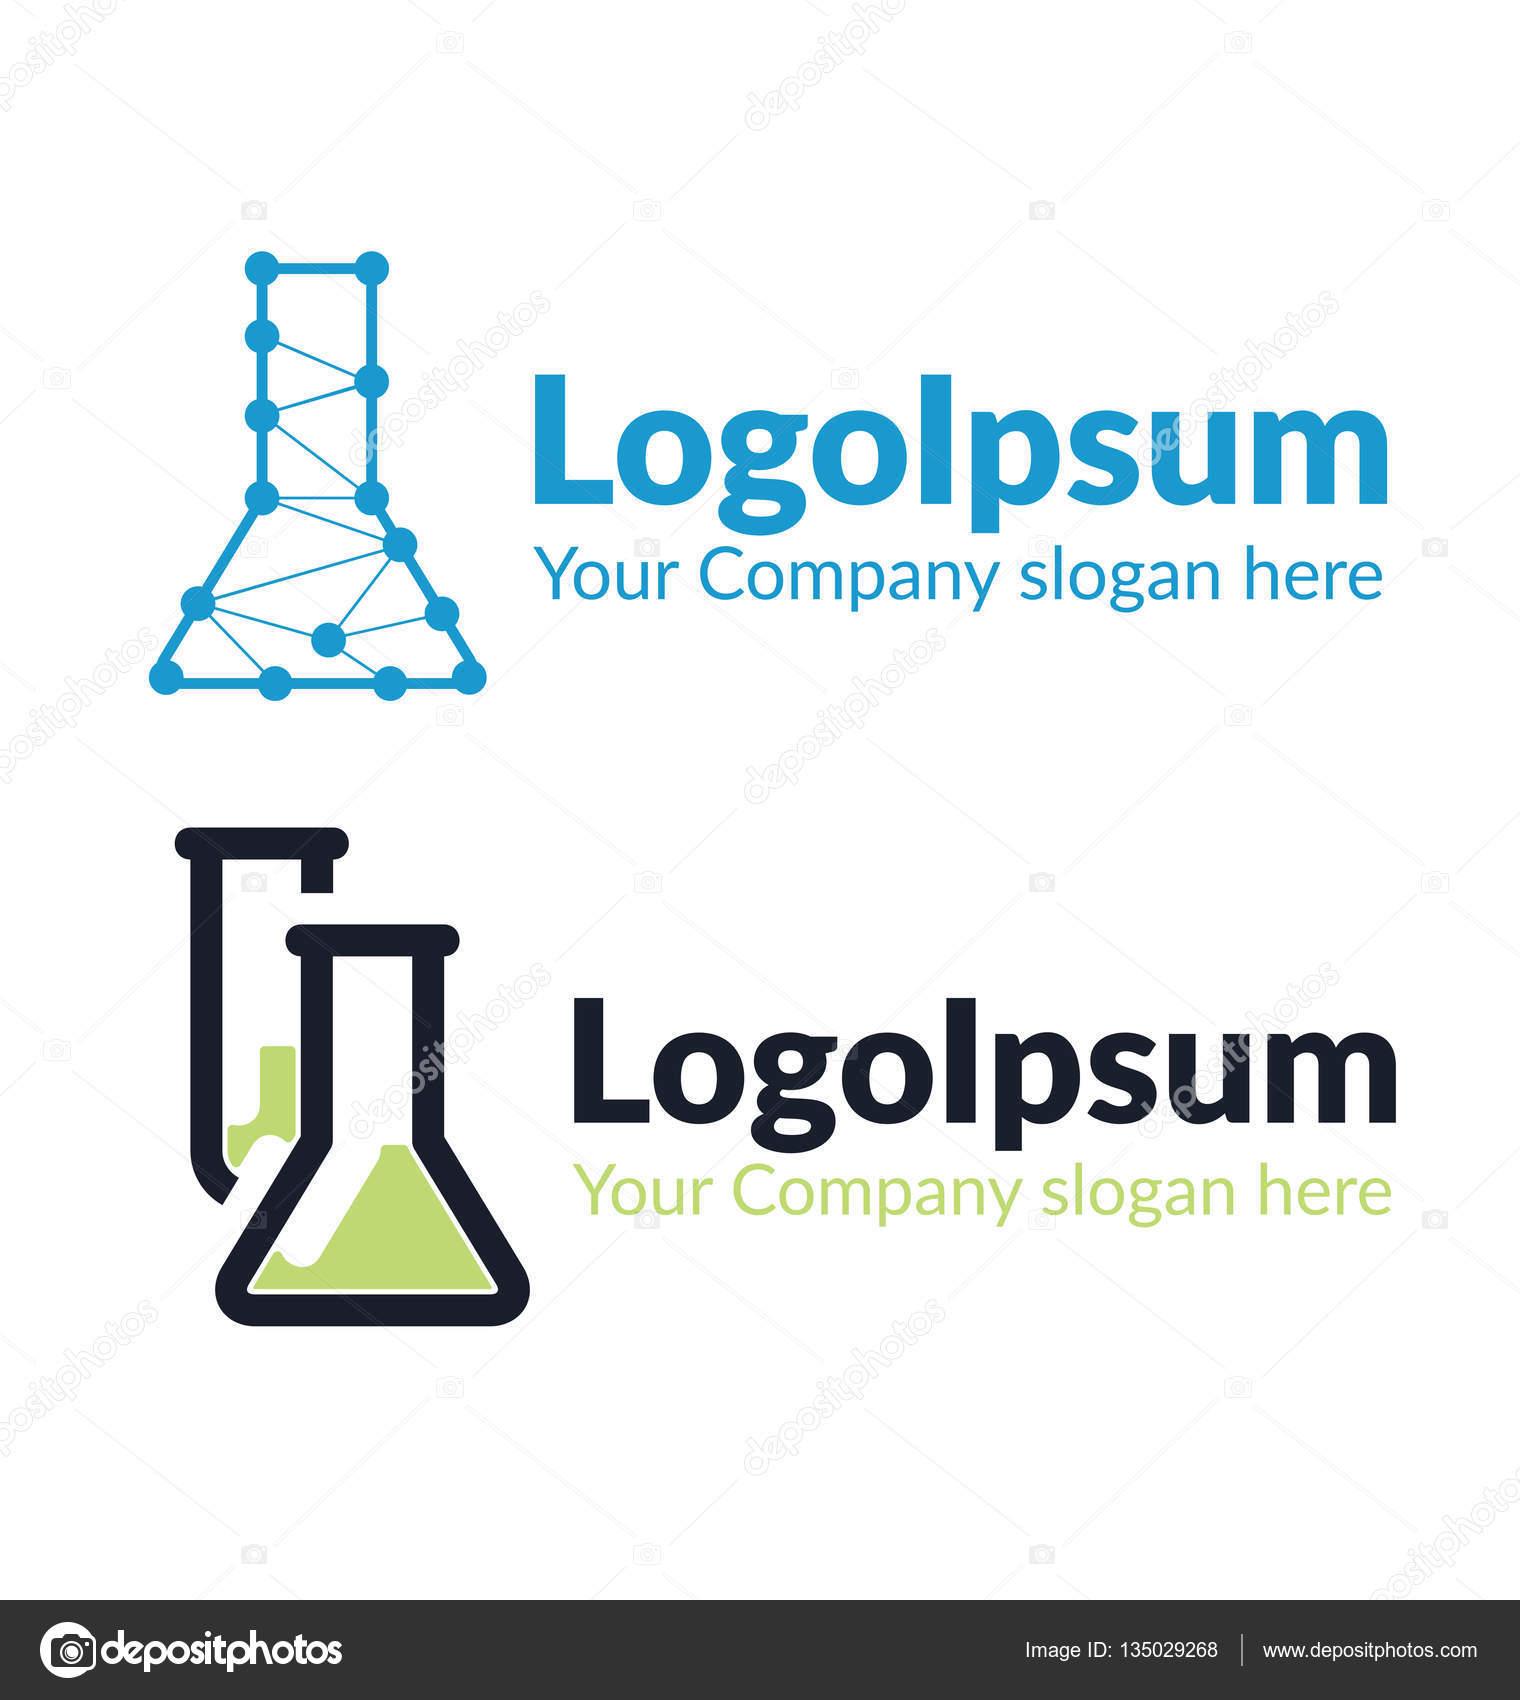 Zwei Vorlagen Logo chemischen Kolben — Stockvektor © sherishe #135029268